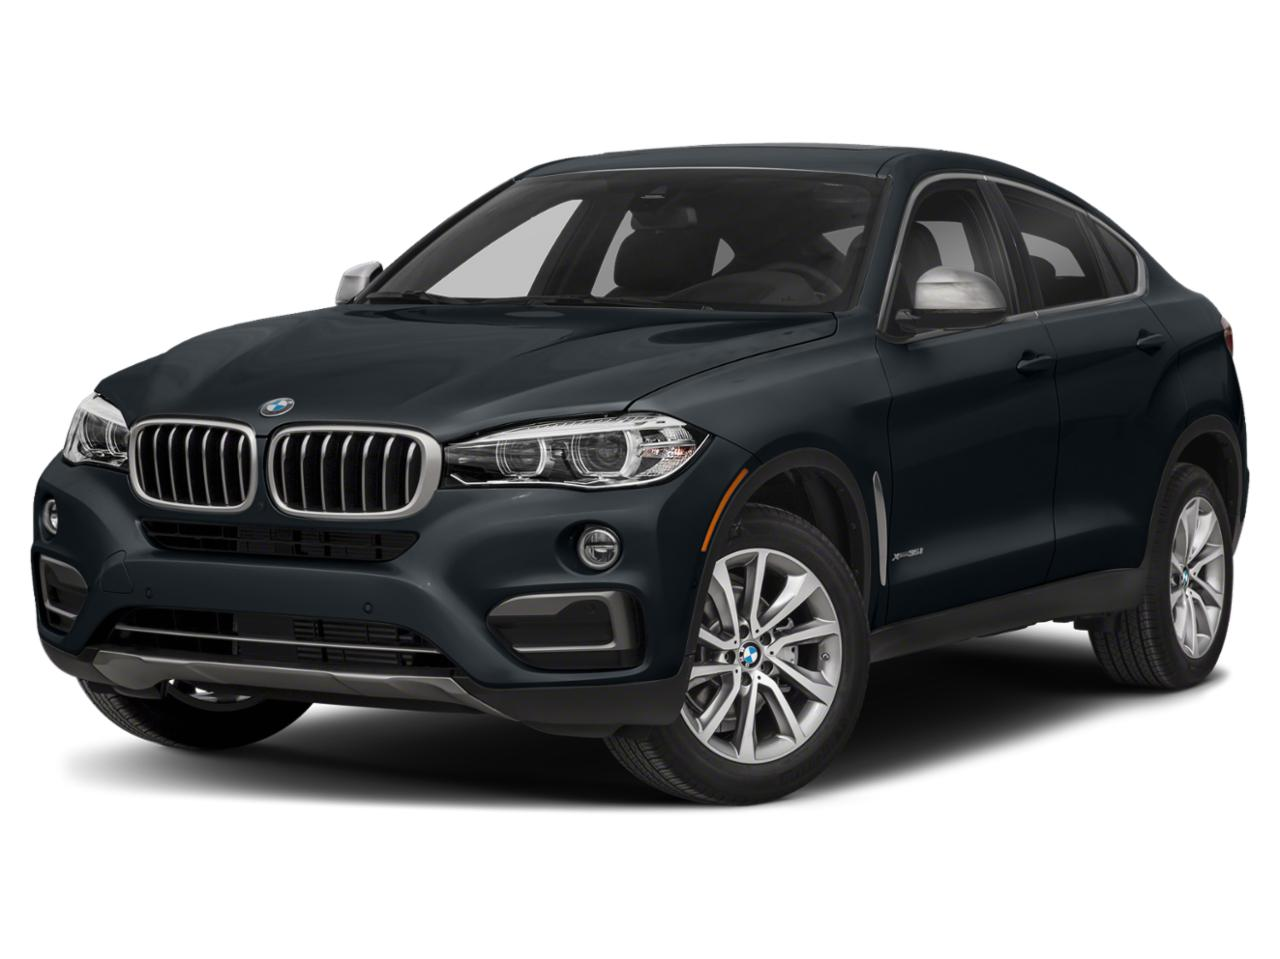 2018 BMW X6 sDrive35i Vehicle Photo in Pleasanton, CA 94588